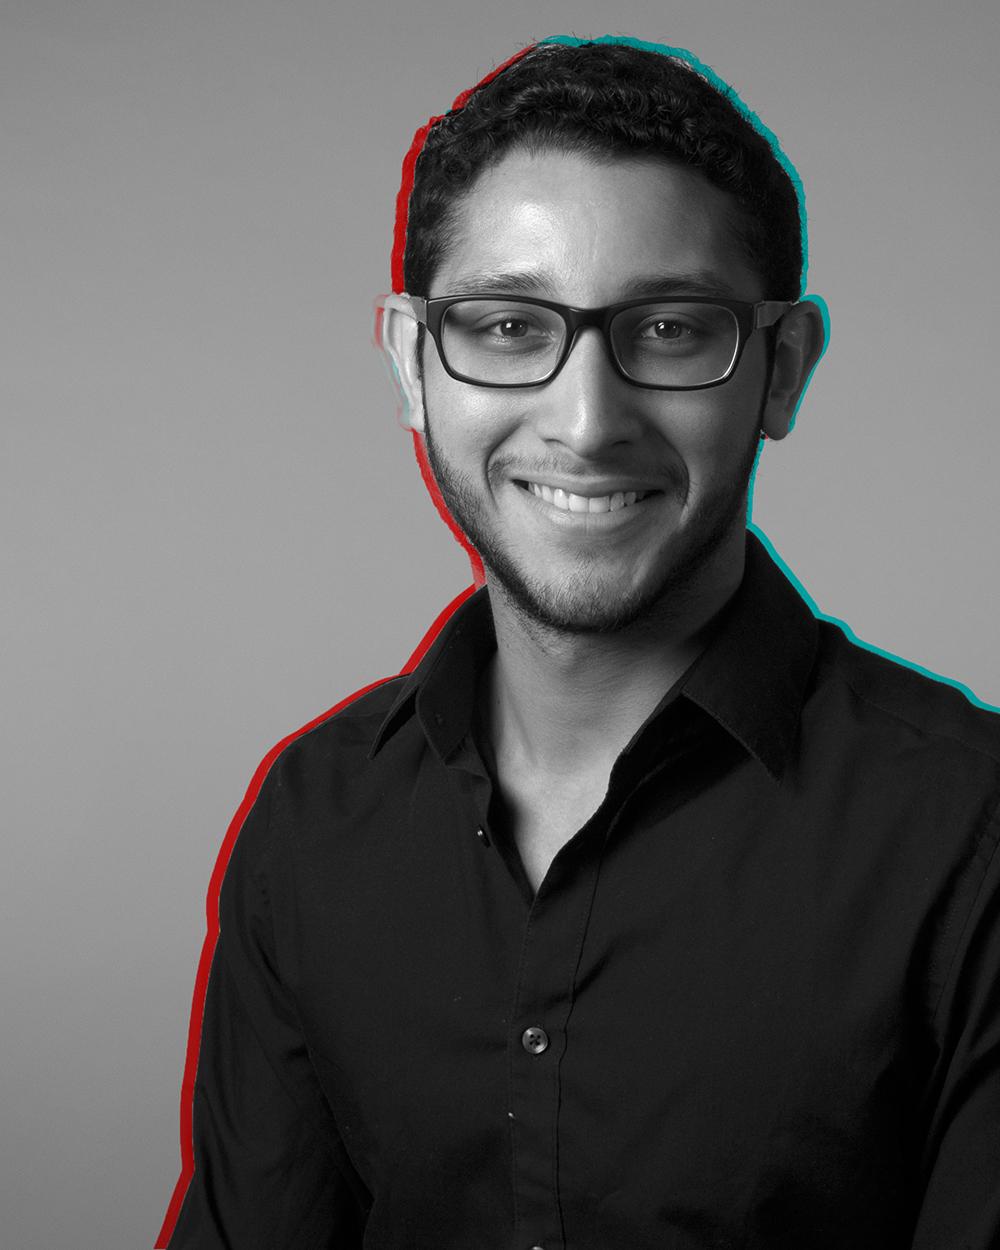 Fernando Hernandez headshot image